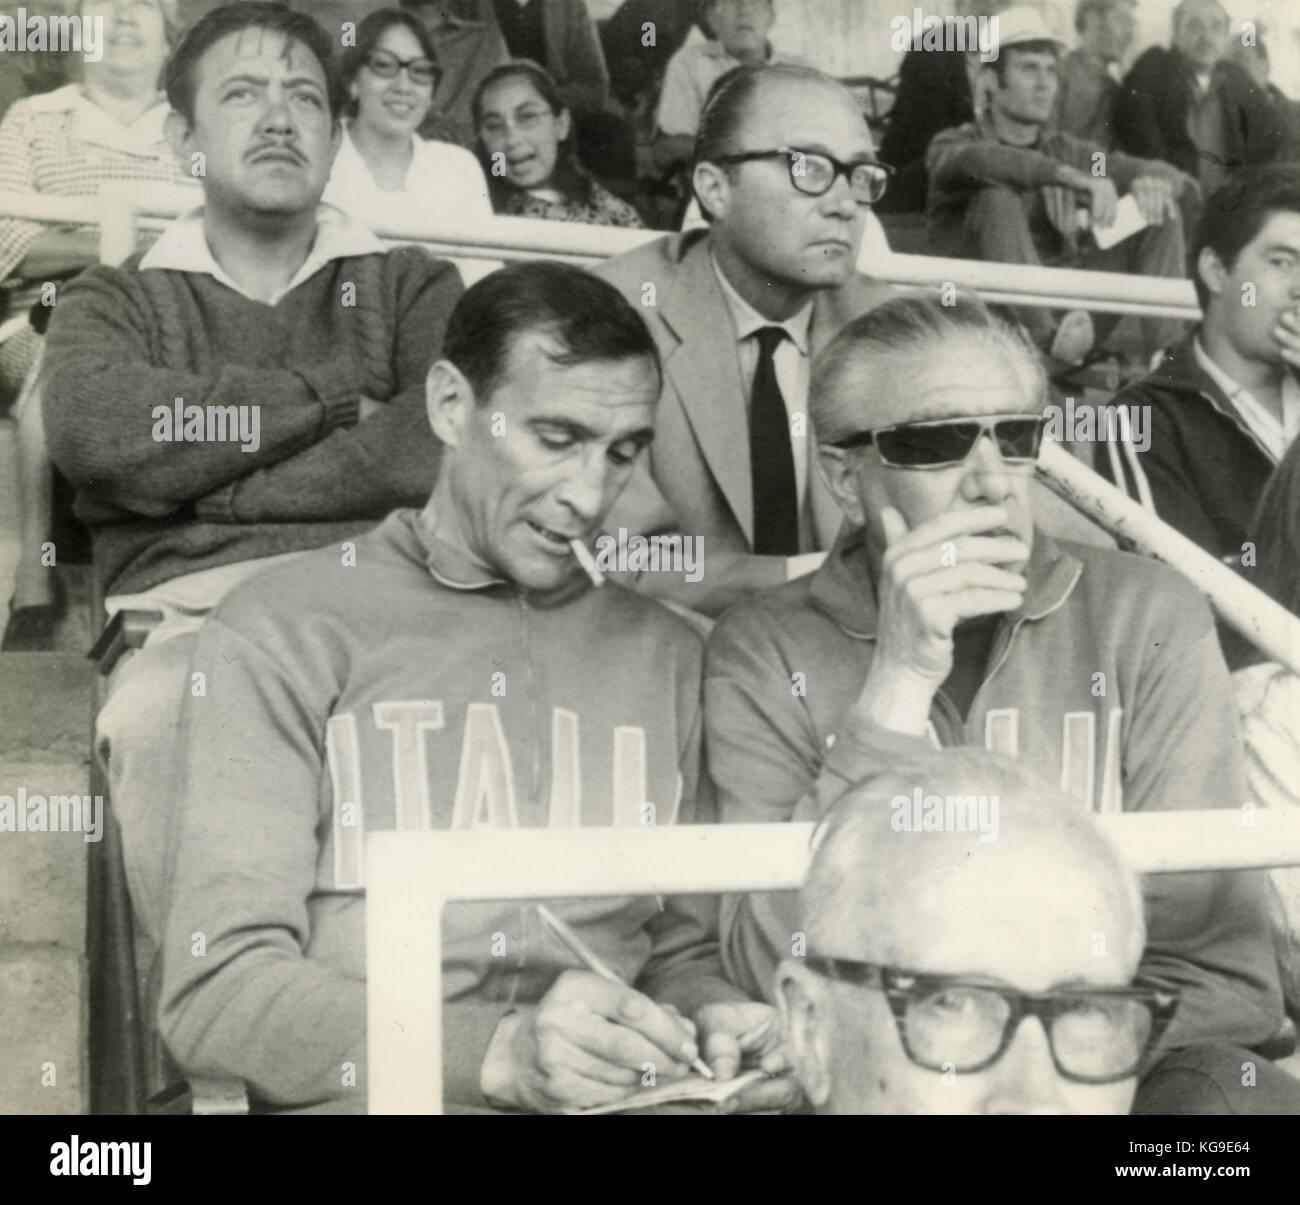 Ferruccio Valcareggi and Enzo Bearzot of the Italian National football team, 1970 - Stock Image